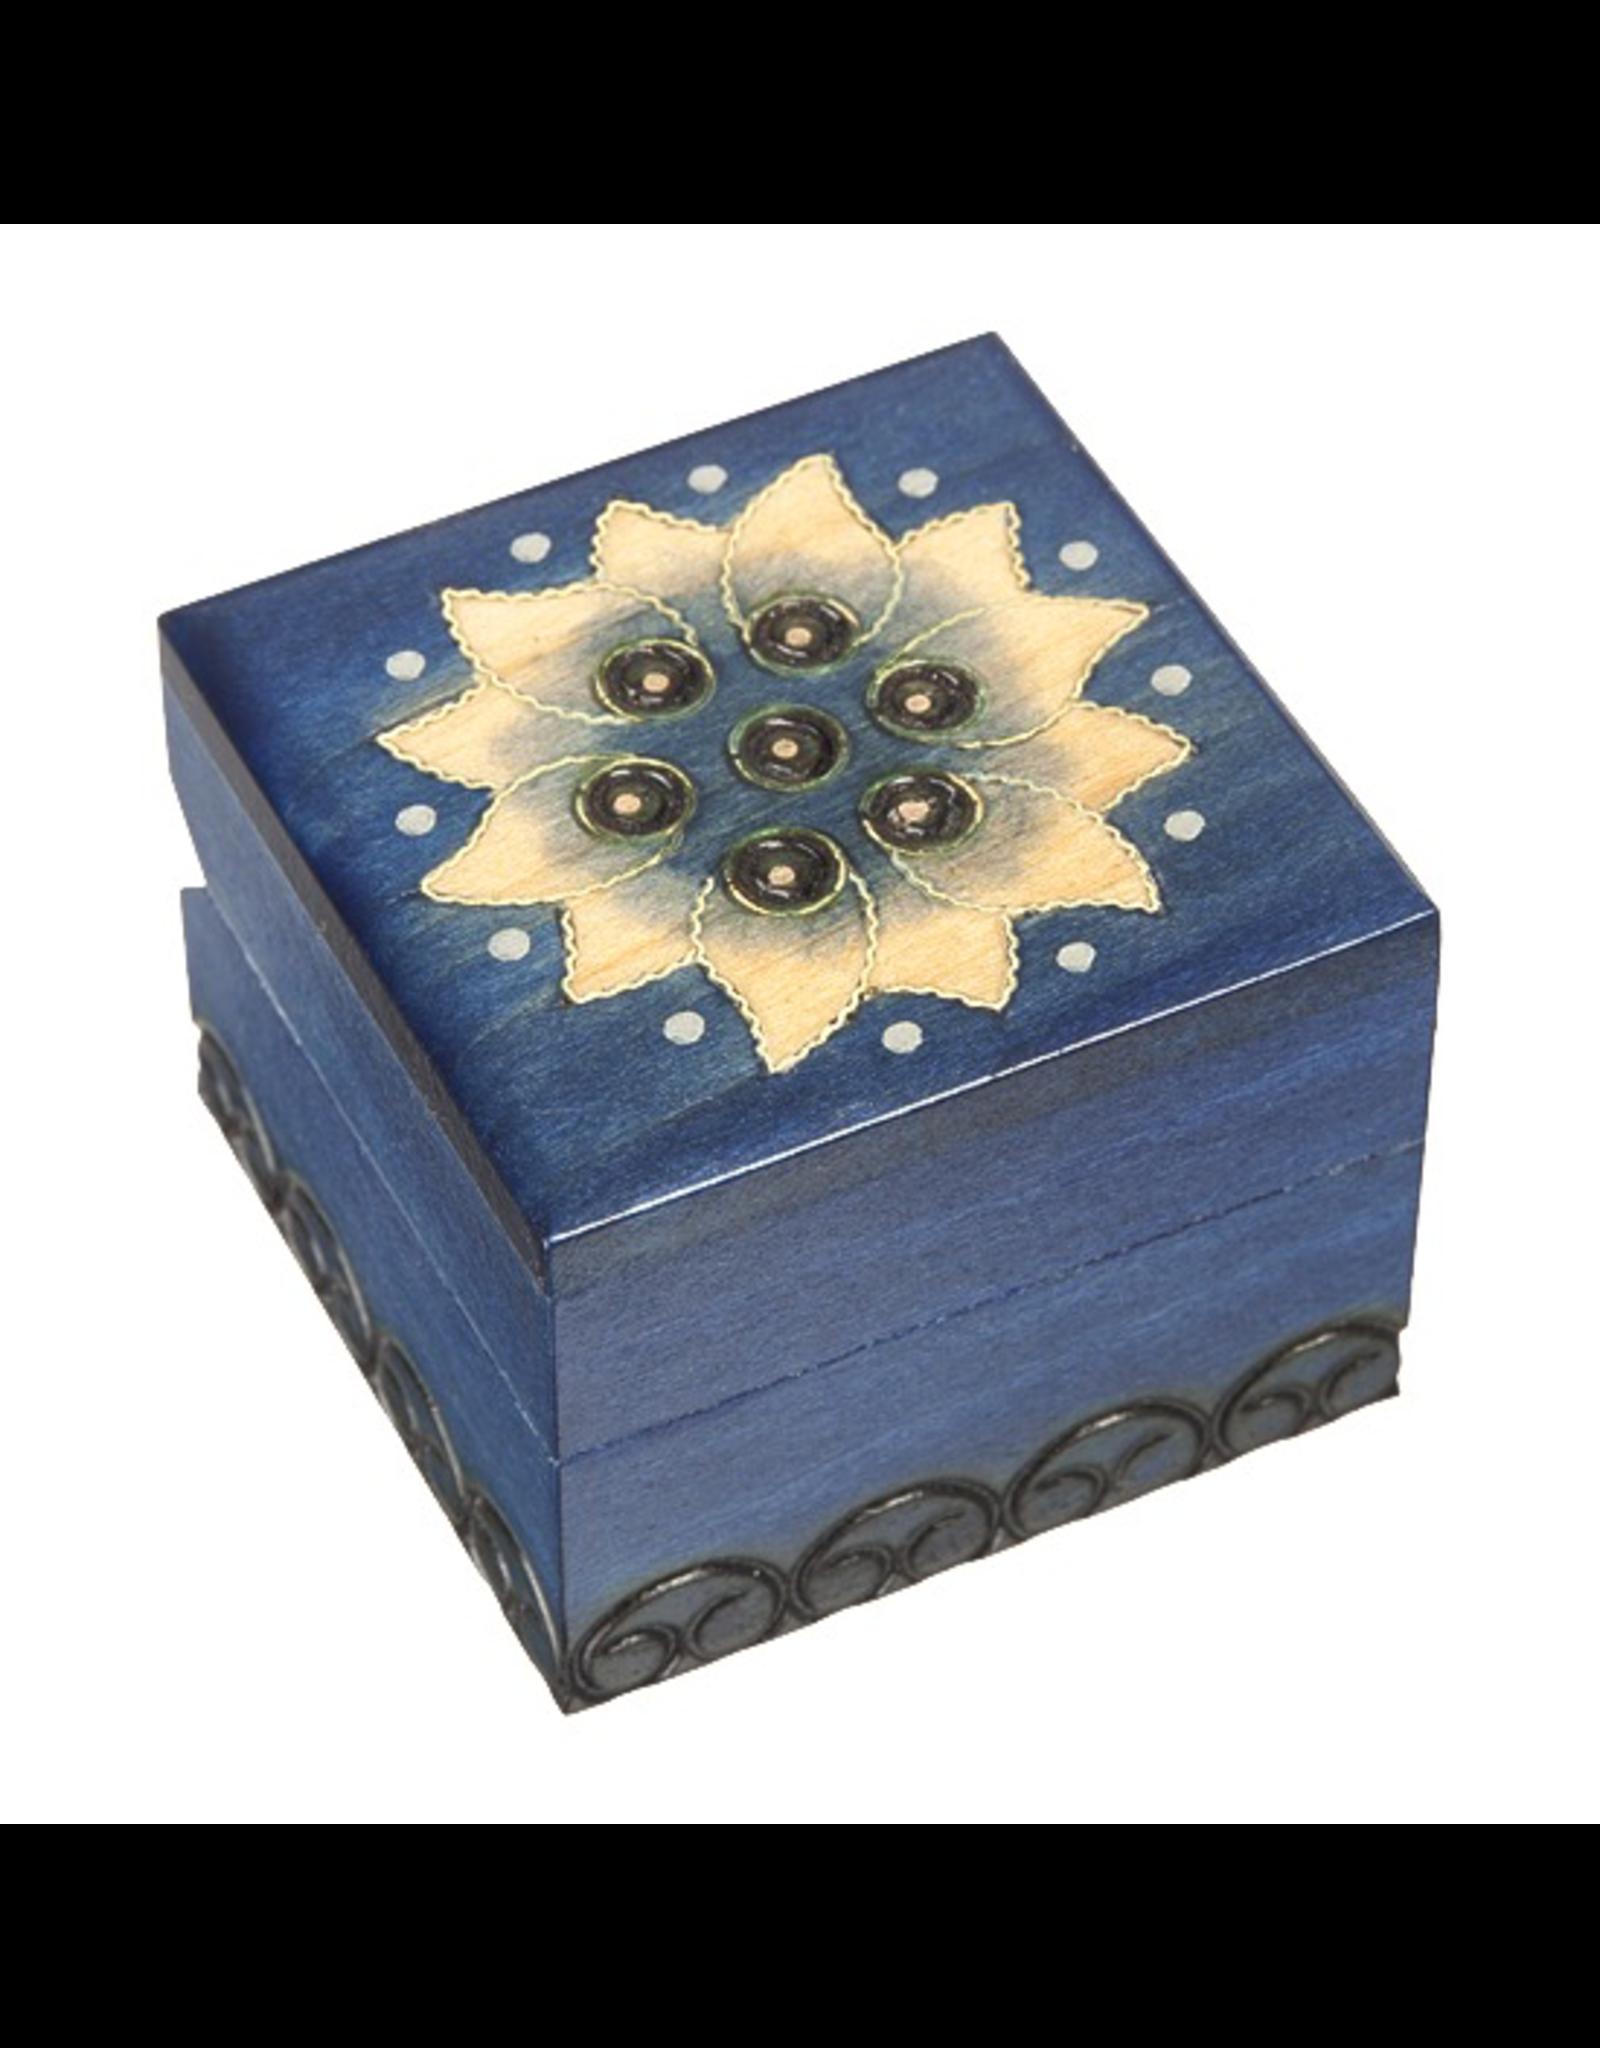 Enchanted Boxes Lotus Flower Small Wood Box